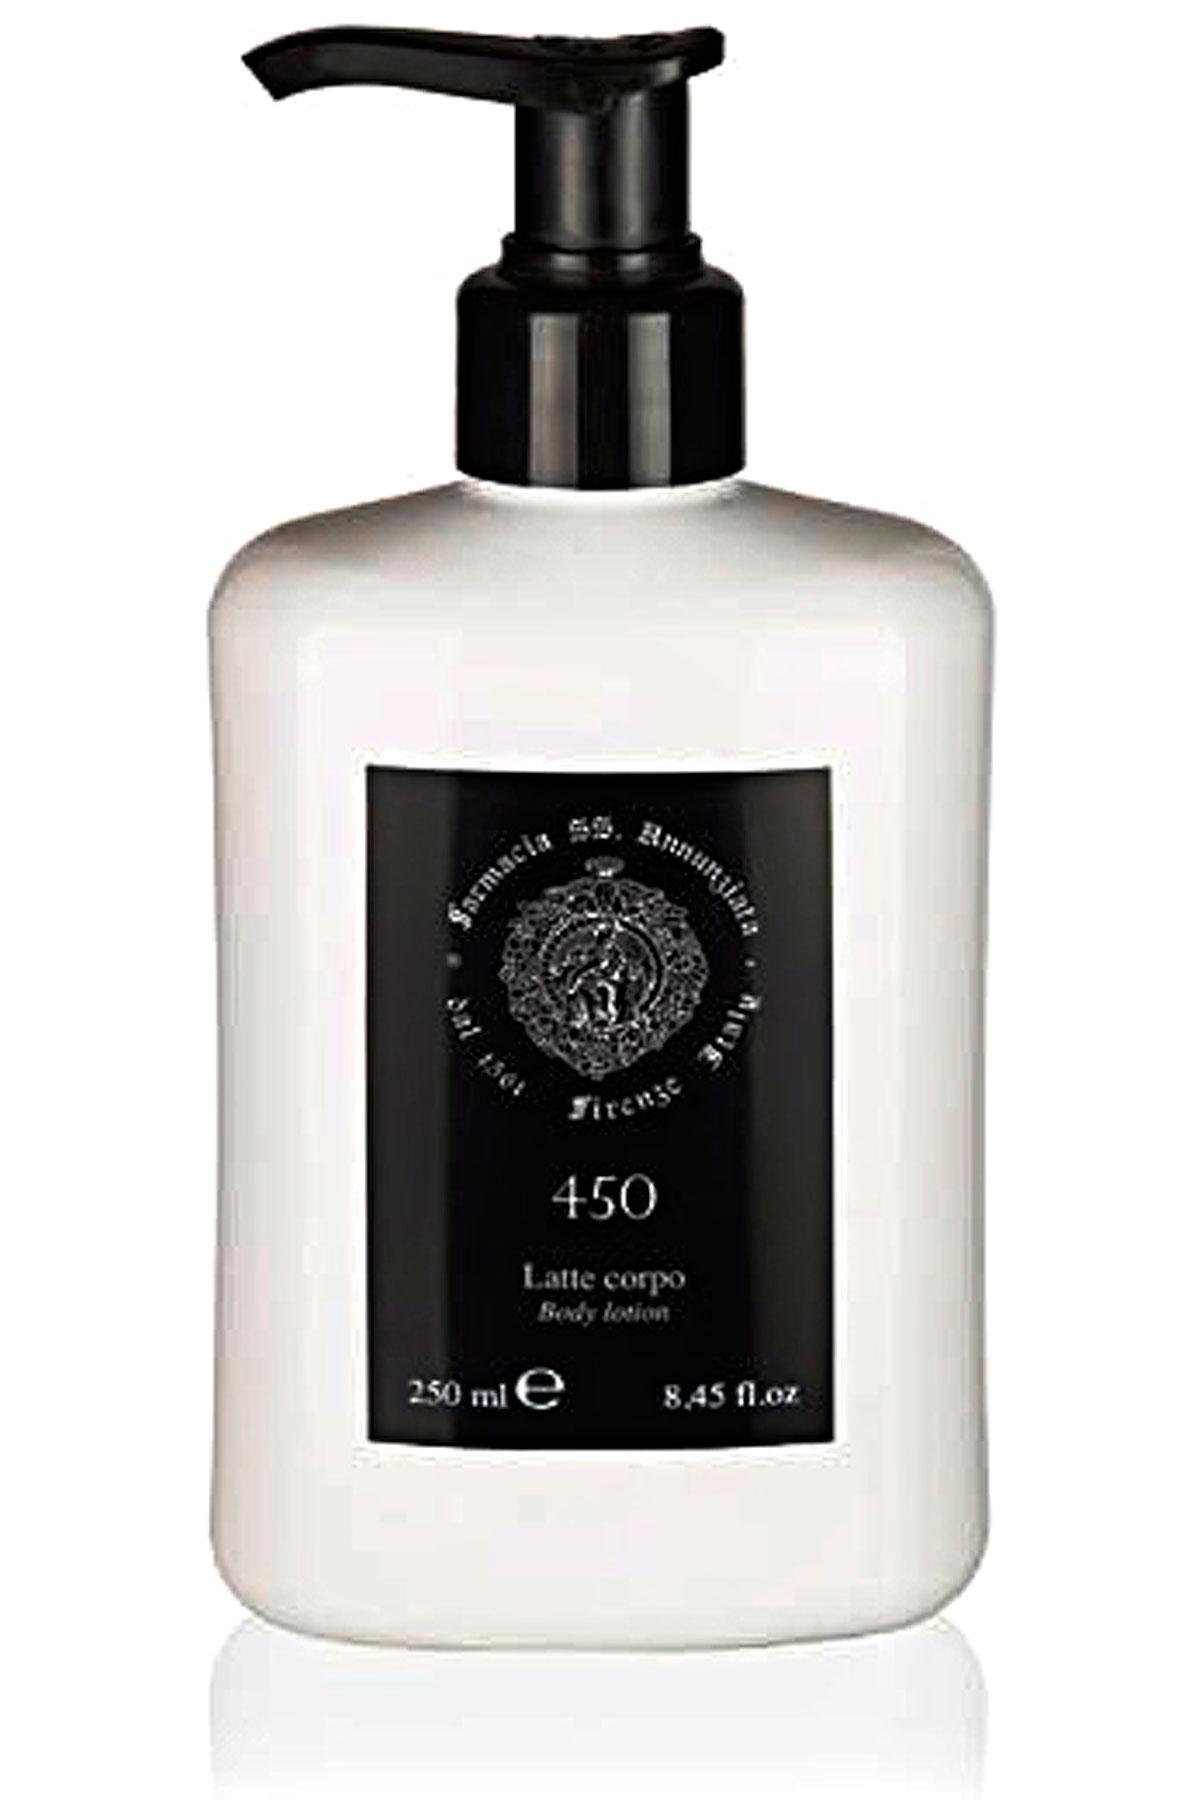 Farmacia Ss Annunziata 1561 Beauty for Men On Sale, 450 - Body Milk - 250 Ml, 2019, 250 ml